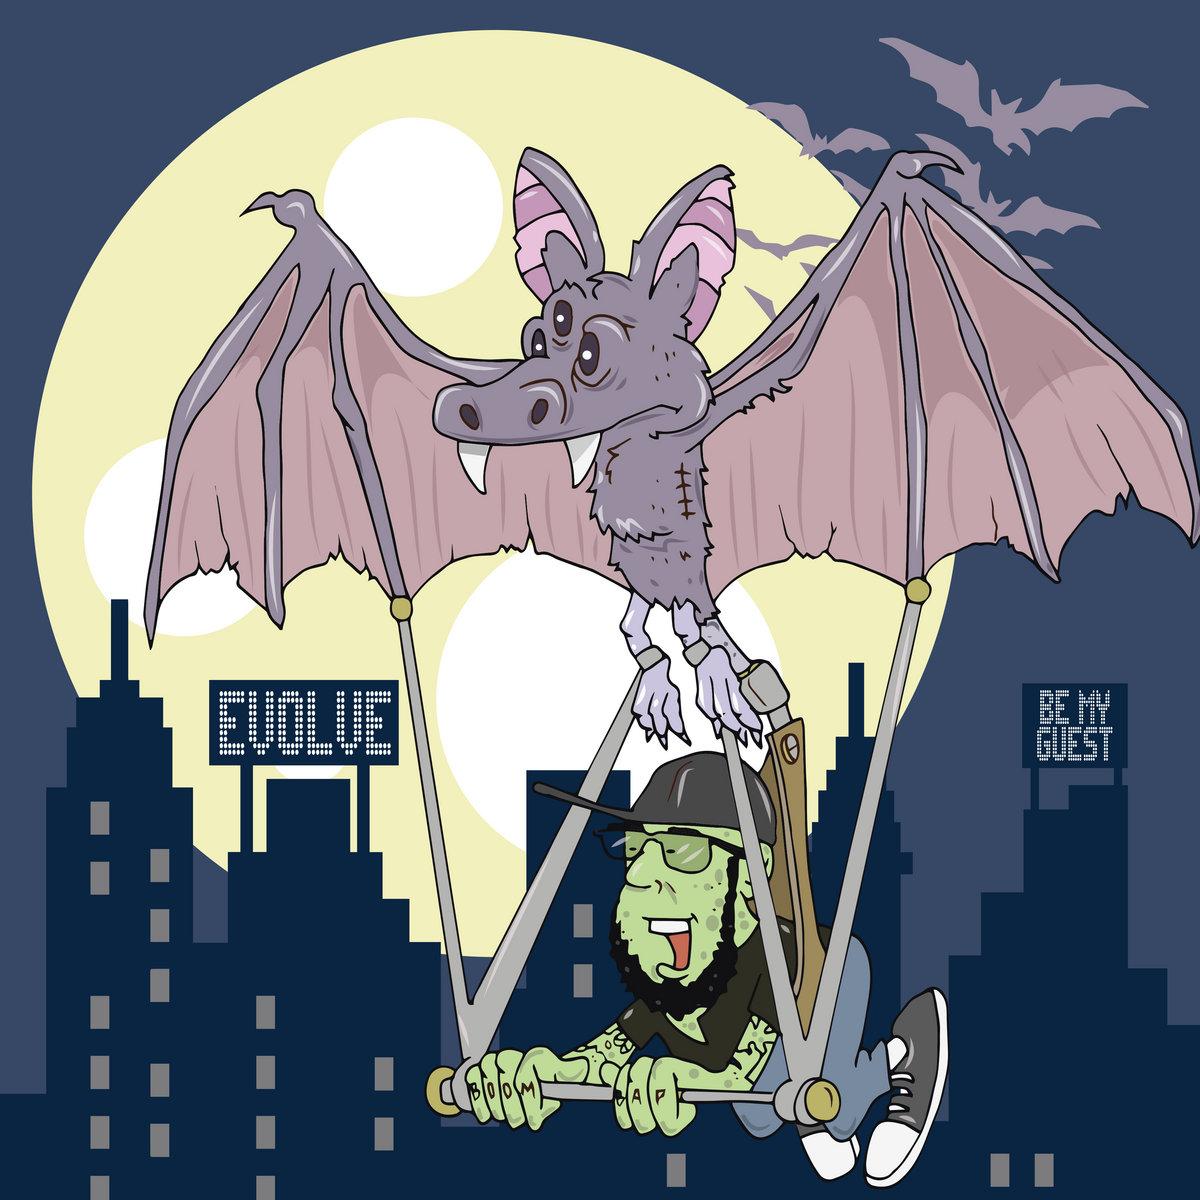 Be my guest w bonus tracks evolve by evolve malvernweather Gallery